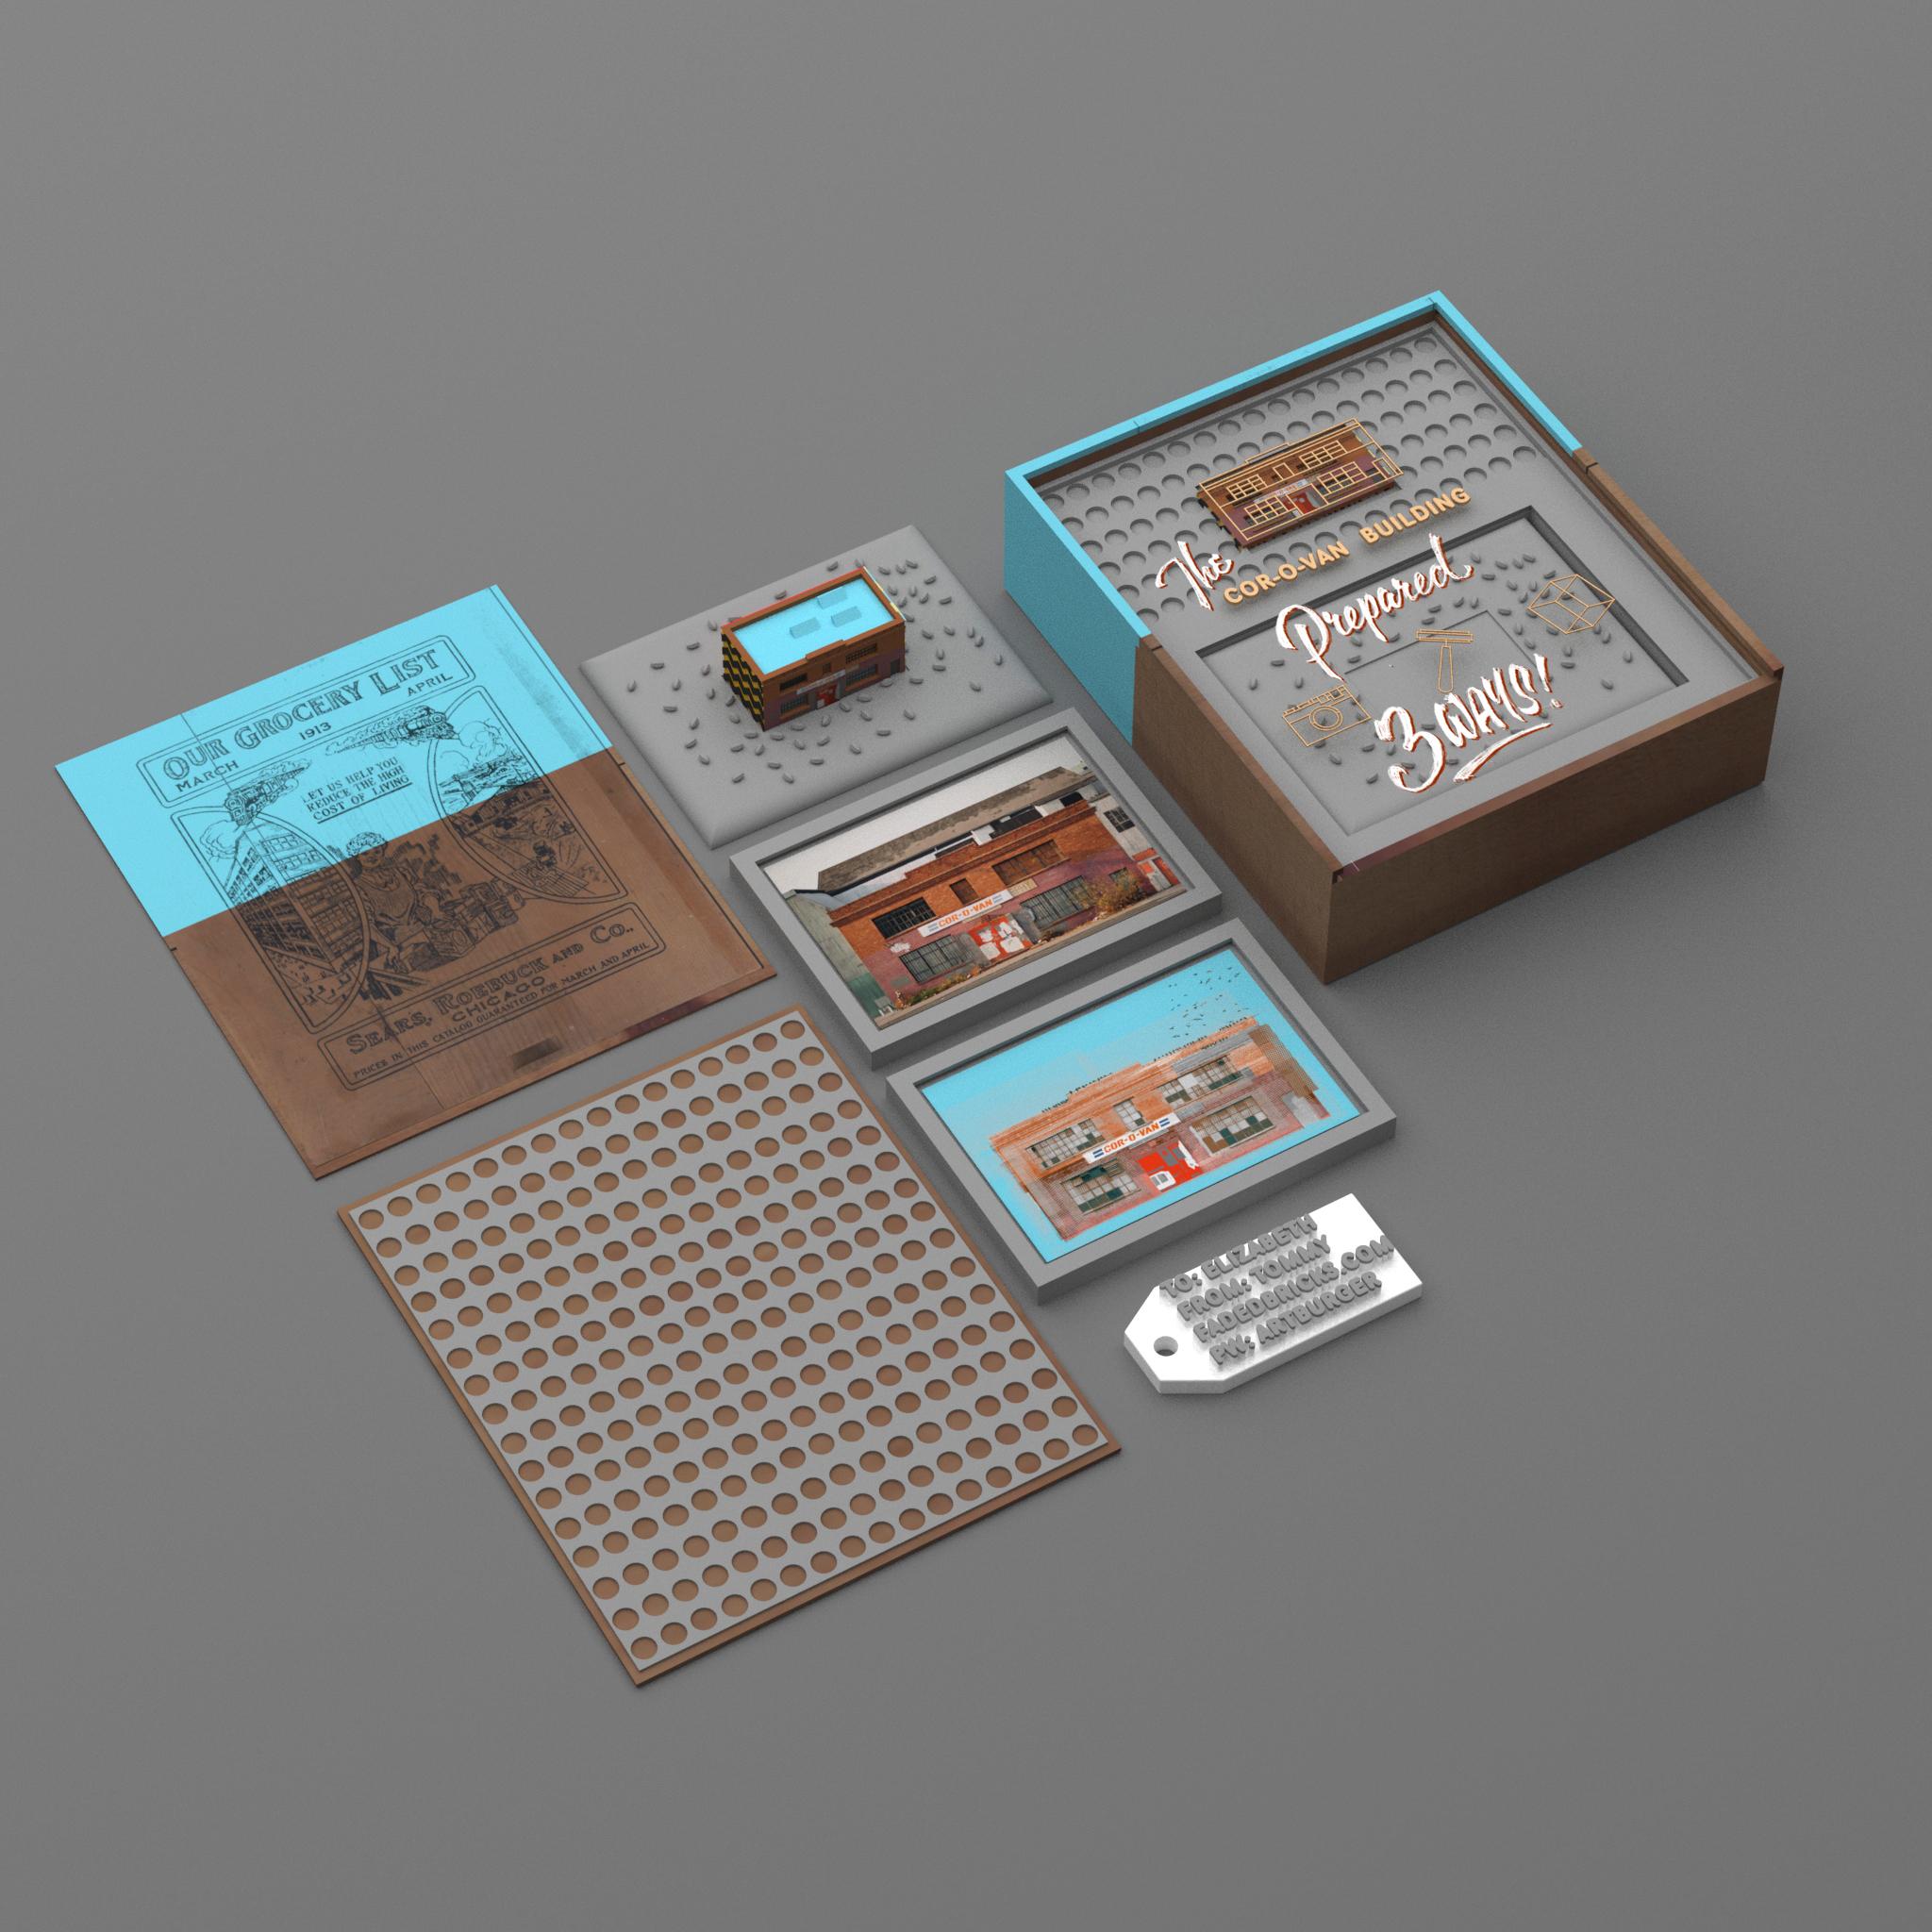 box_layout_gray.jpg